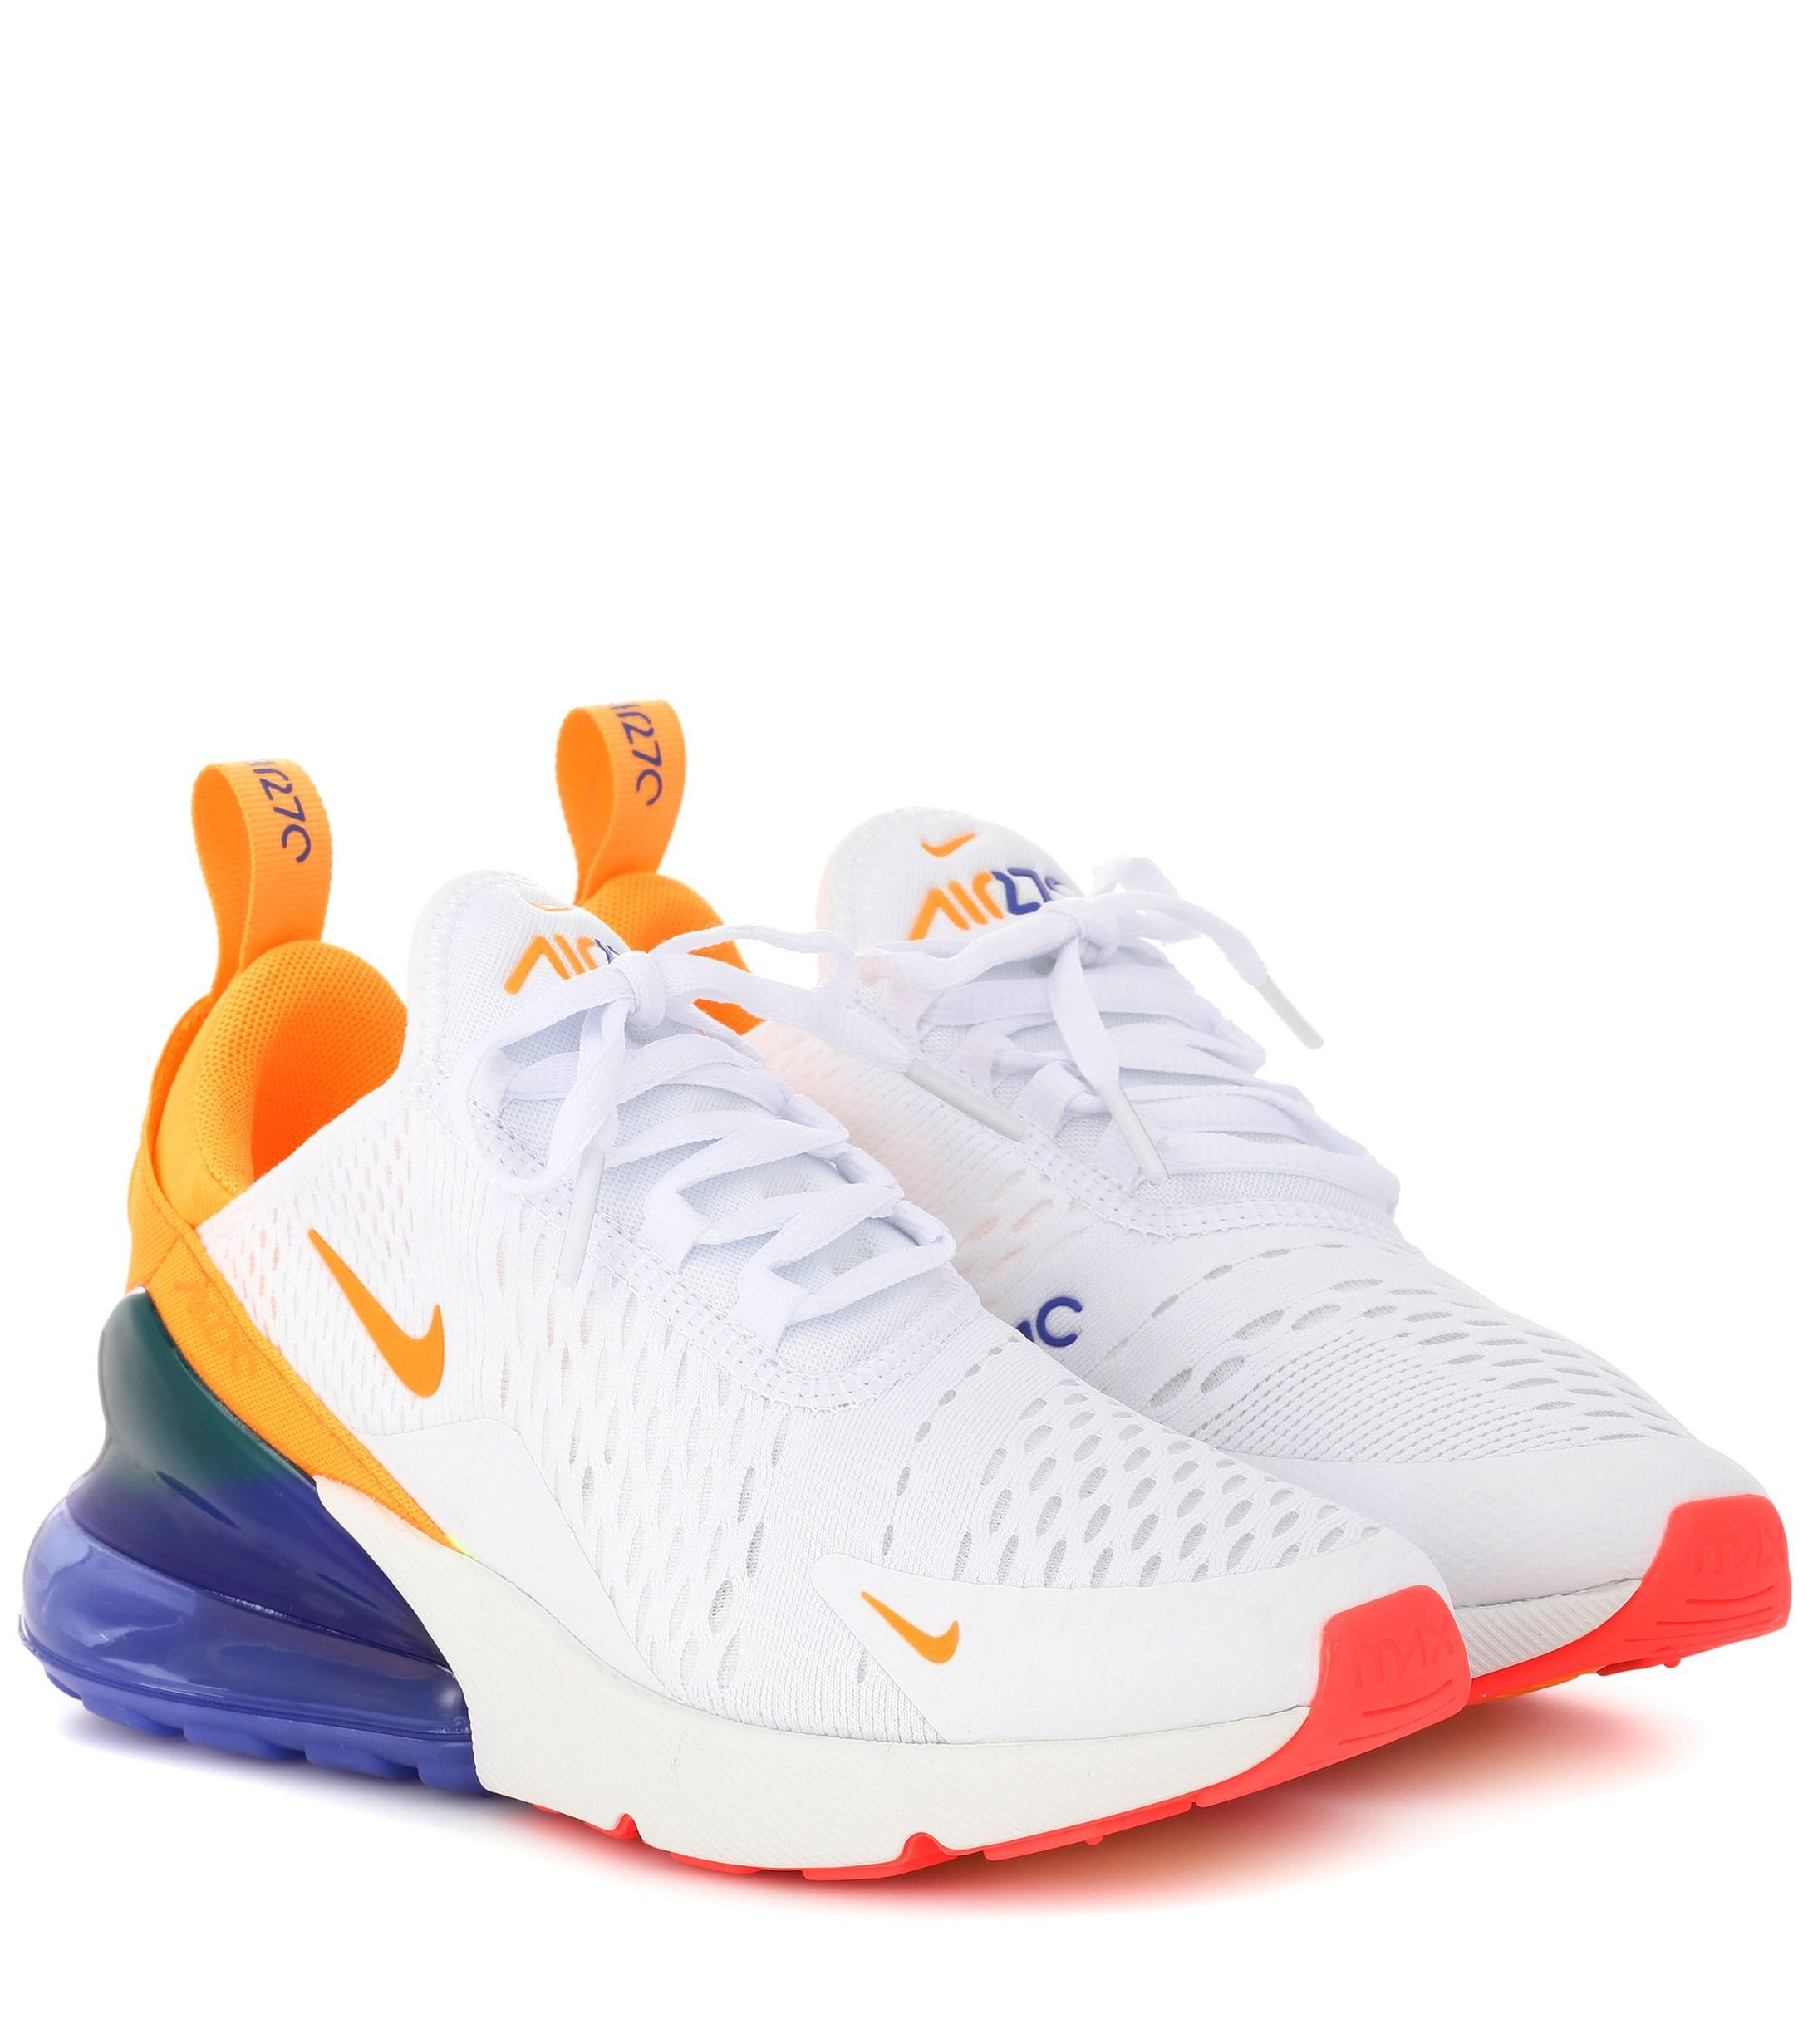 the latest 03d01 78e7e Nike White Air Max 270 Sneakers